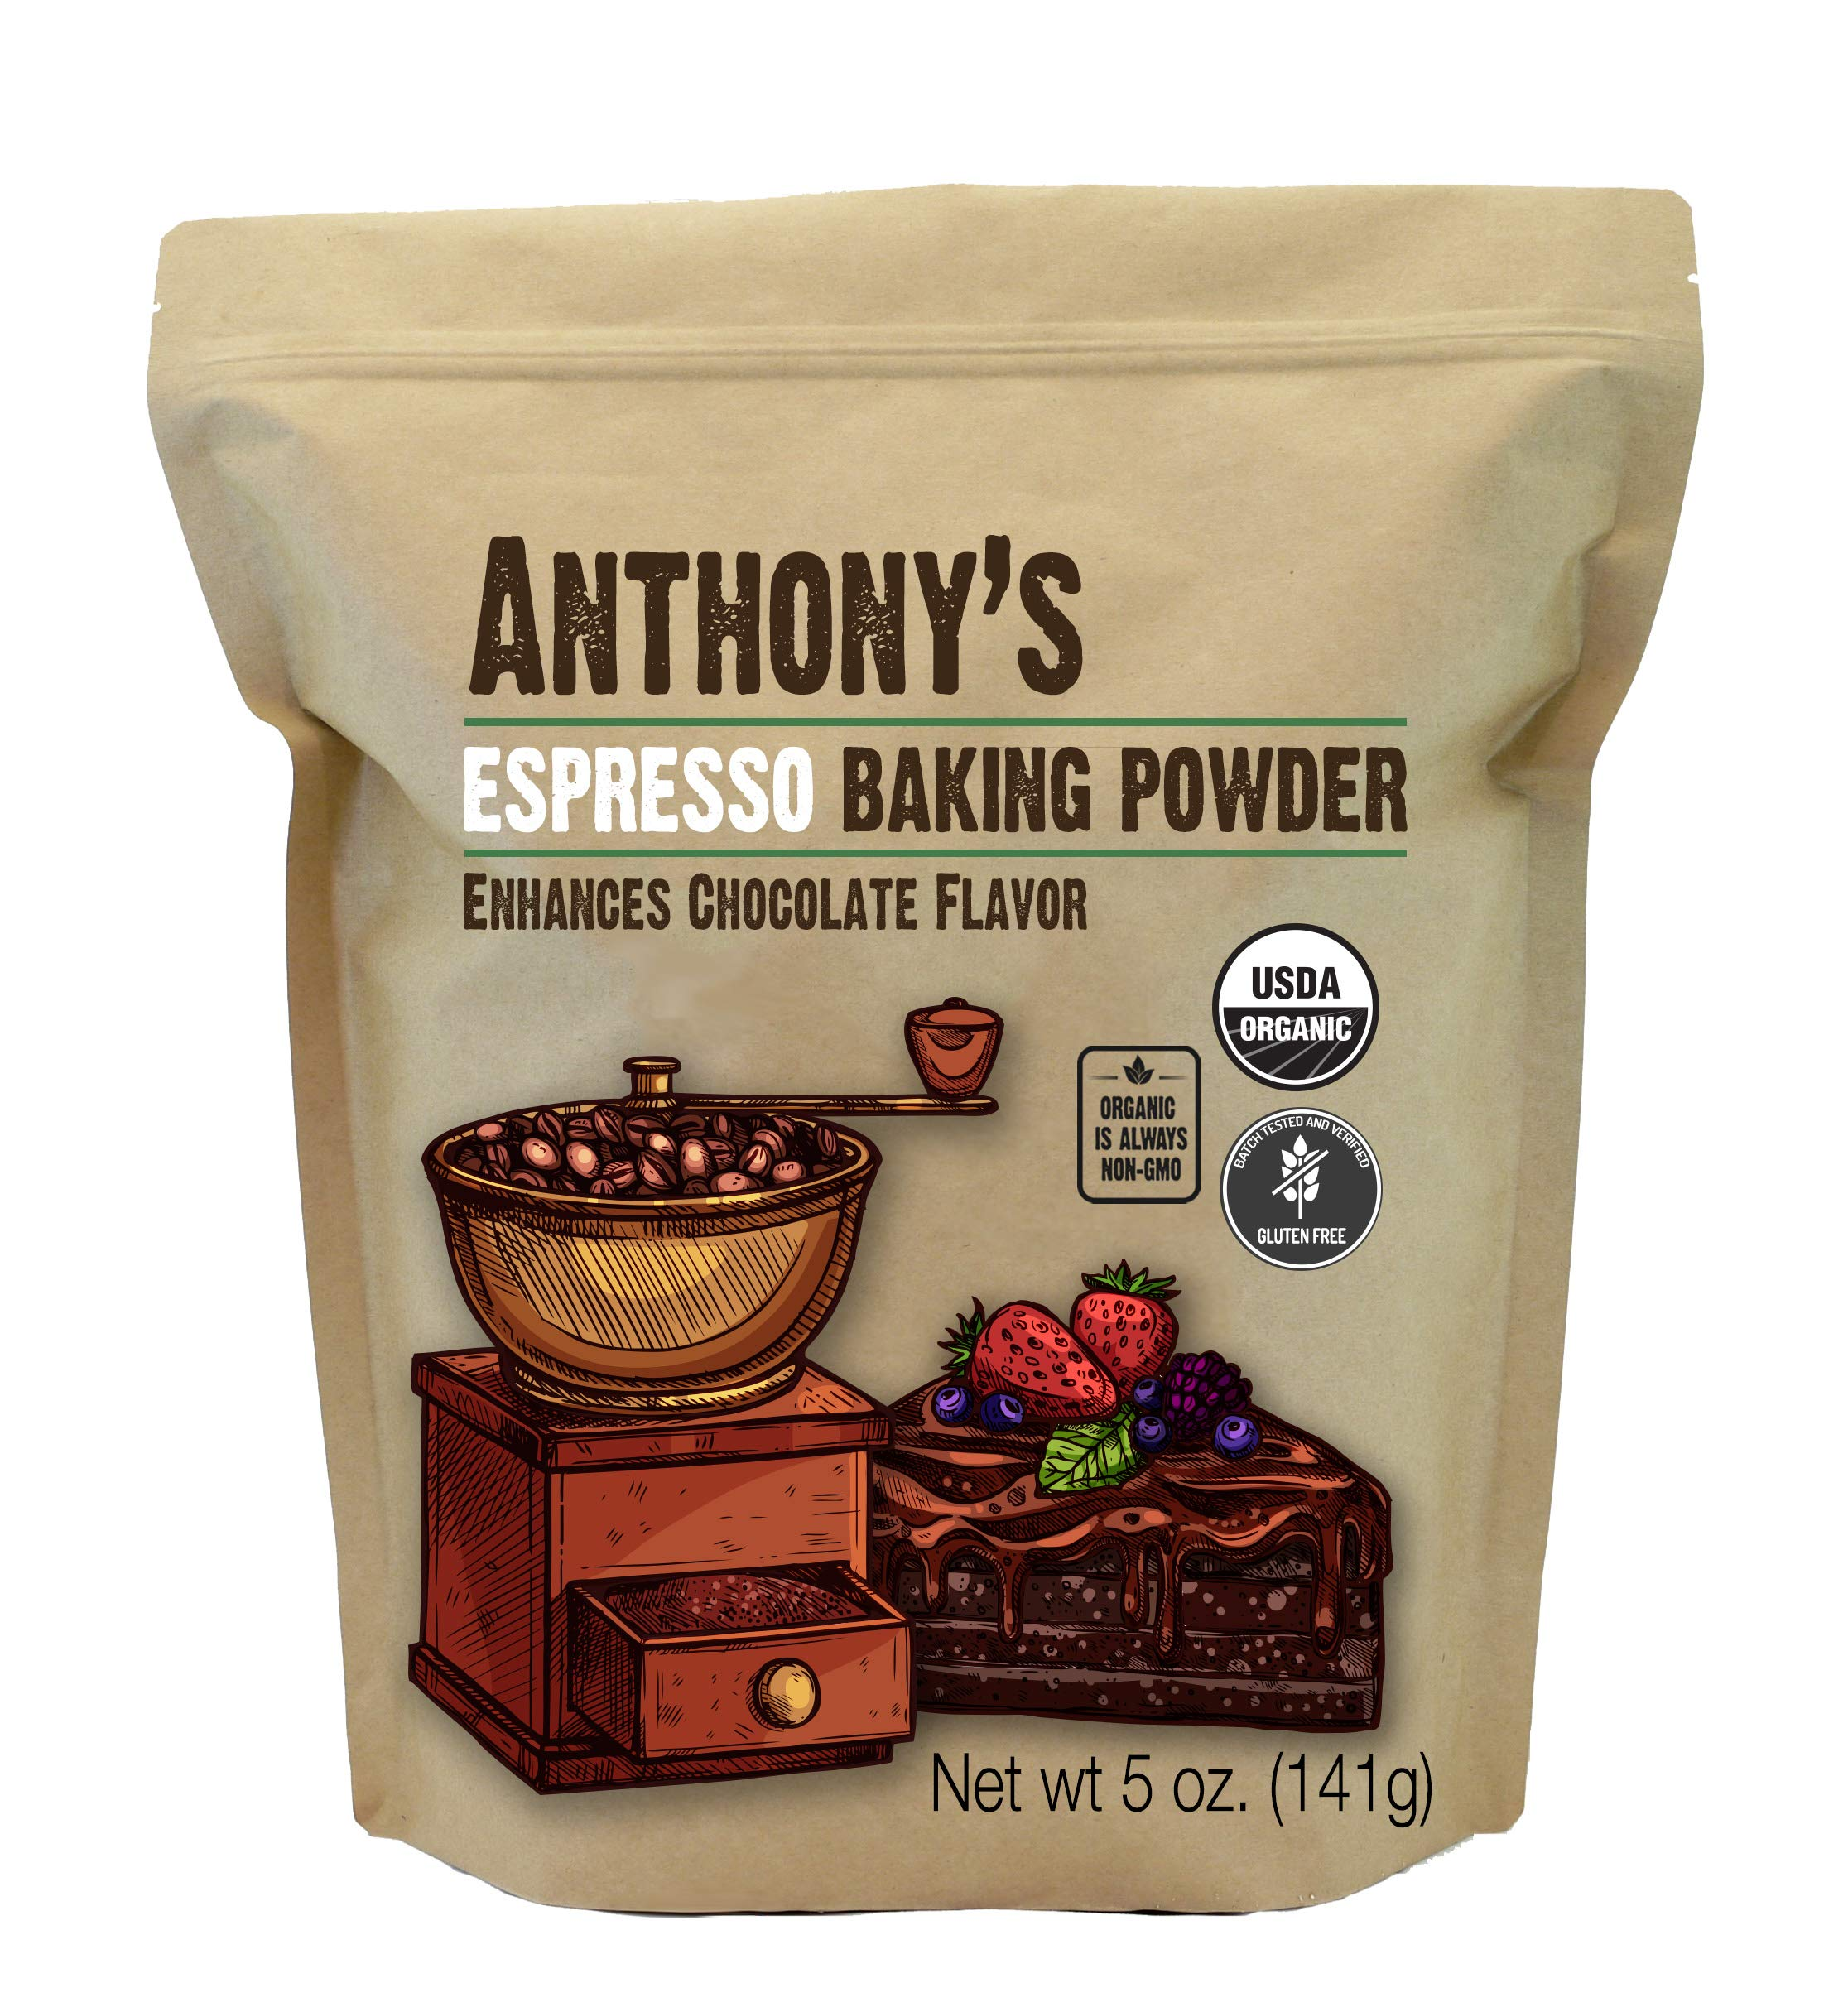 Anthony's Organic Espresso Baking Powder, 5 oz, Gluten Free, Non GMO, Enhances Chocolate Flavor